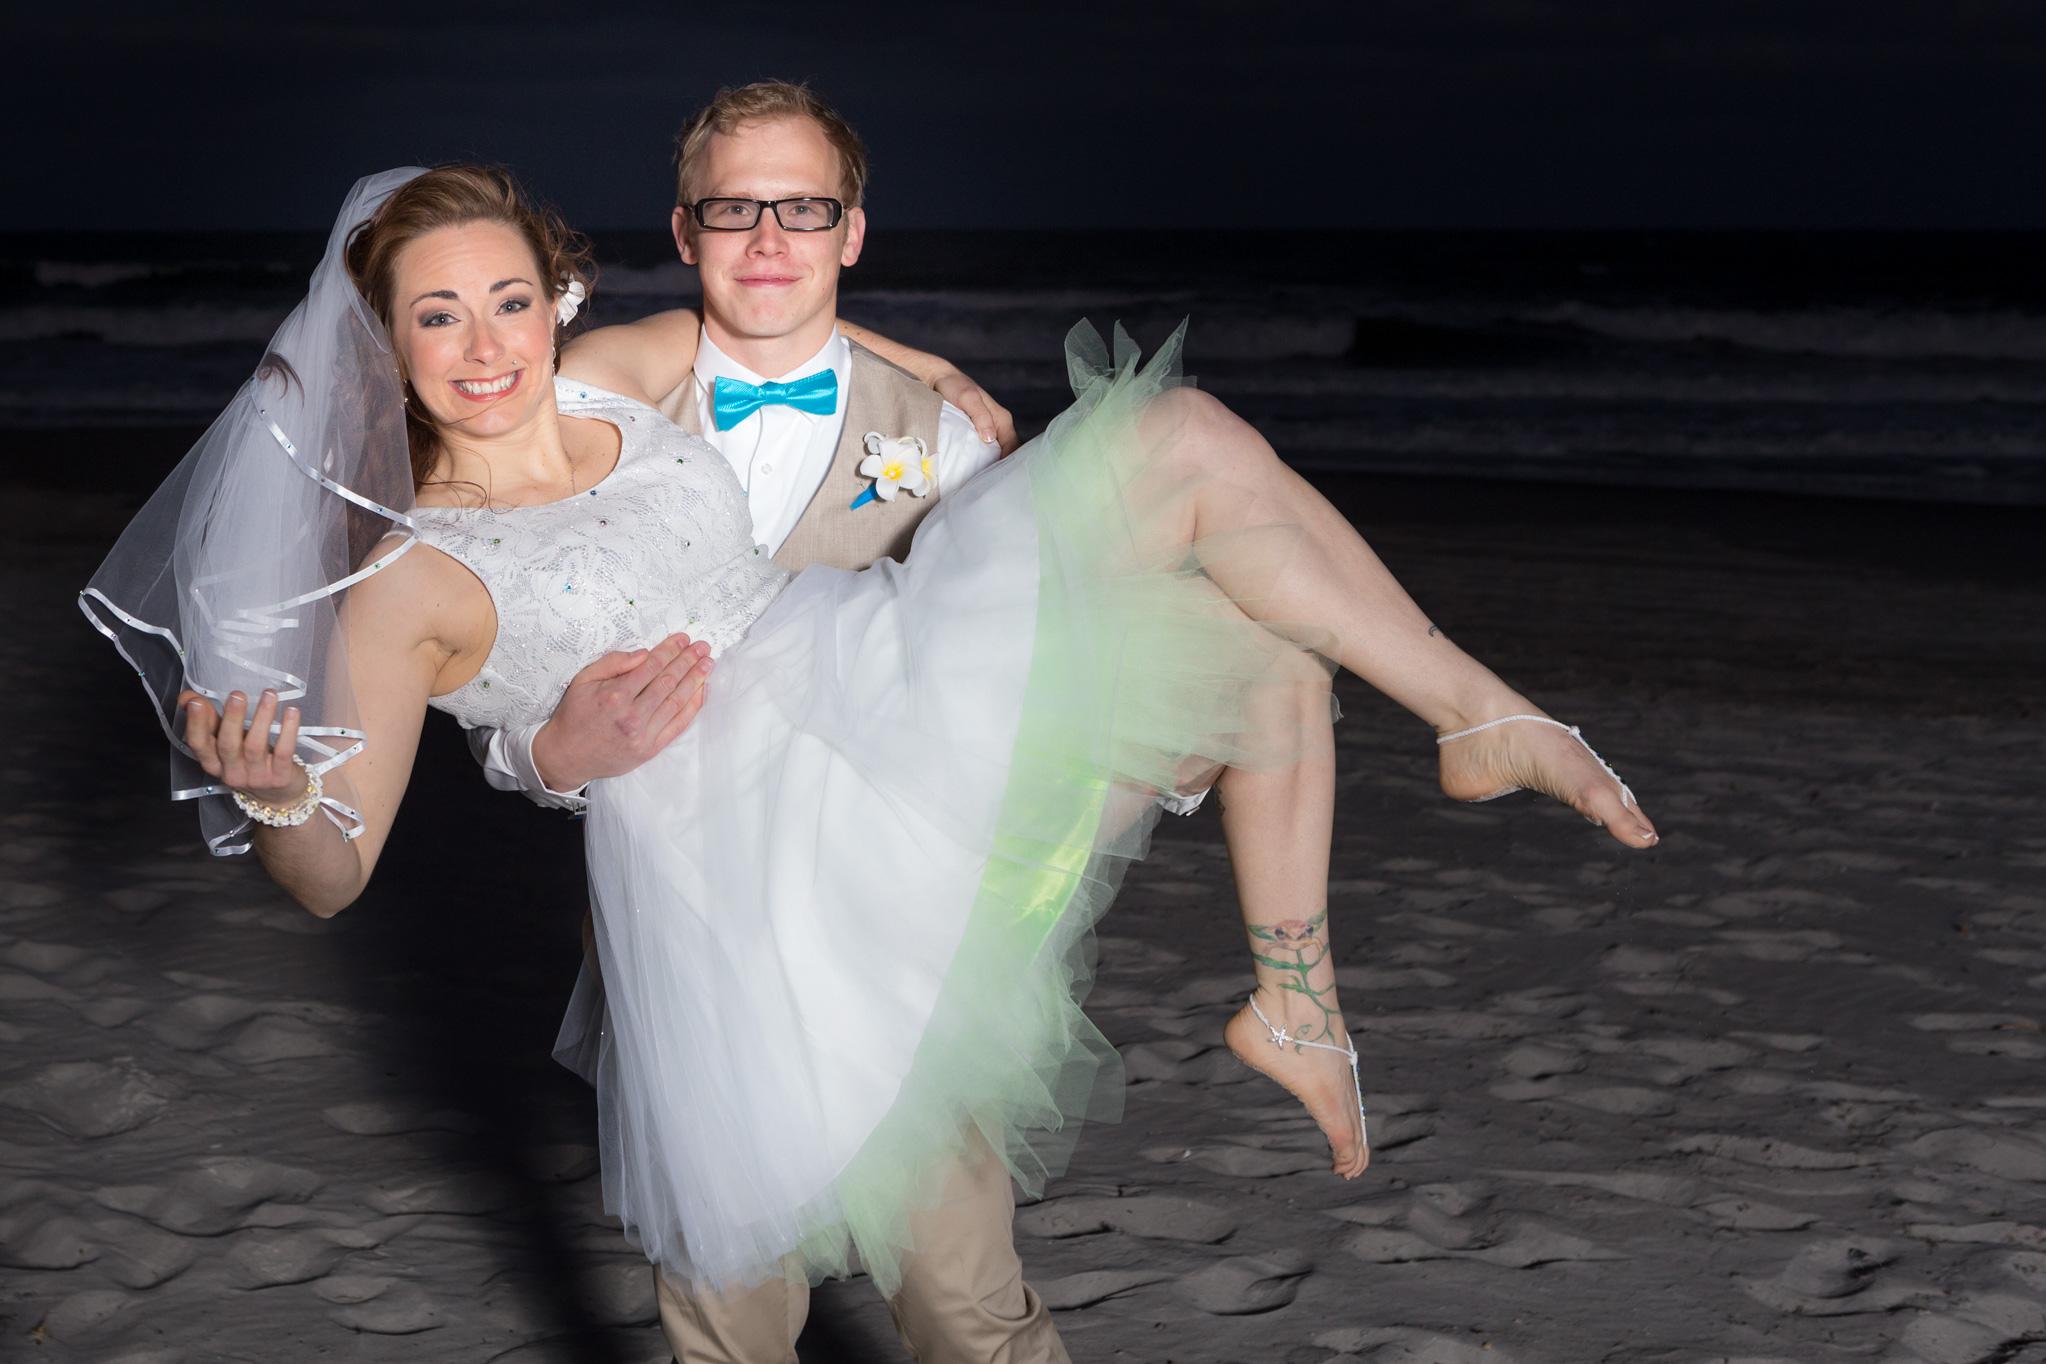 bride_groom_wedding_photography_3.jpg